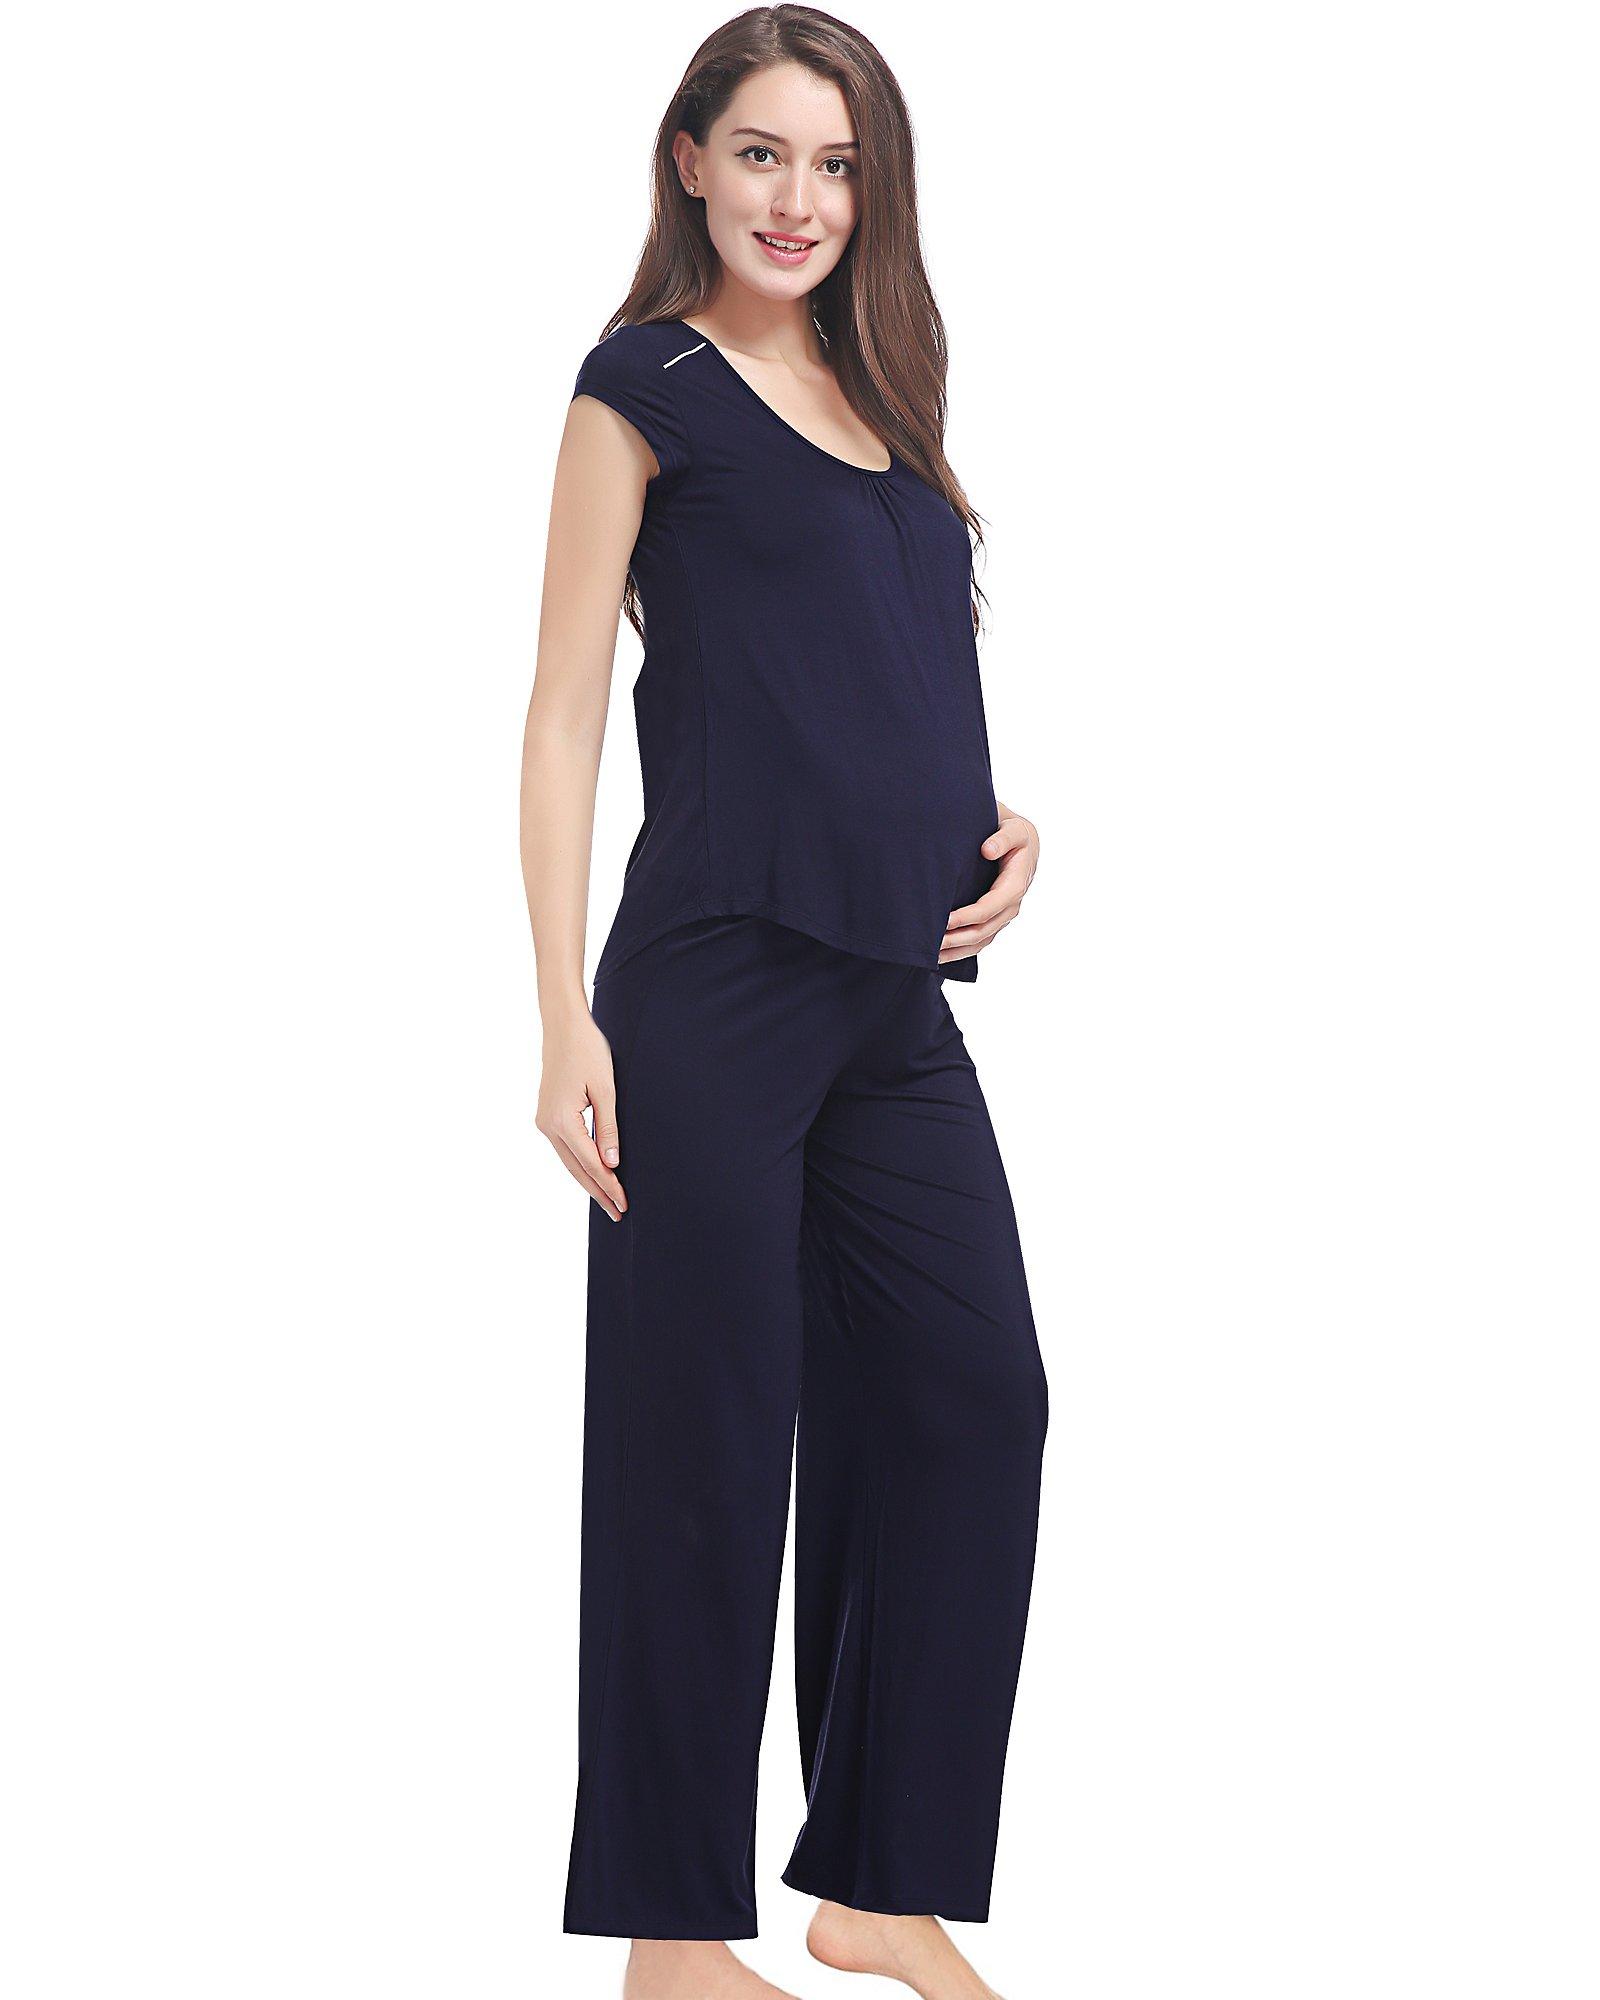 GYS Soft Bamboo Maternity Loungewear Nursing Pajama Pants Set, Navy Blue, M